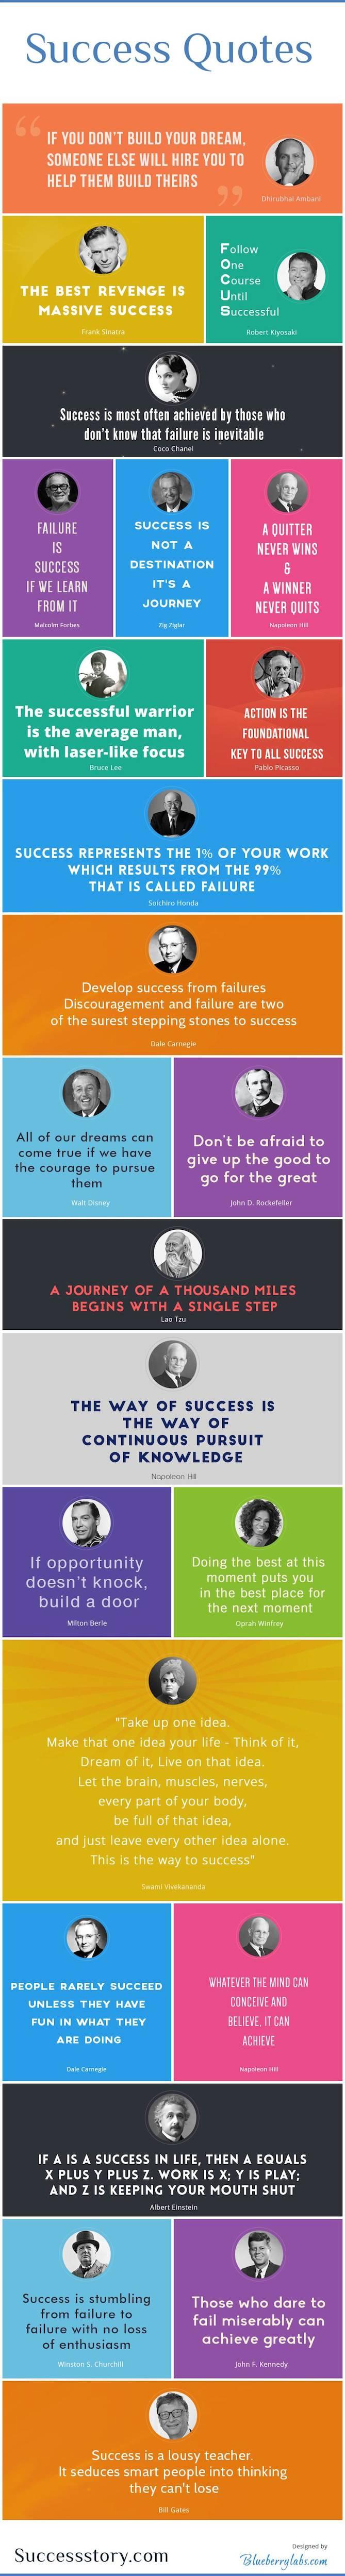 success_IG.jpg